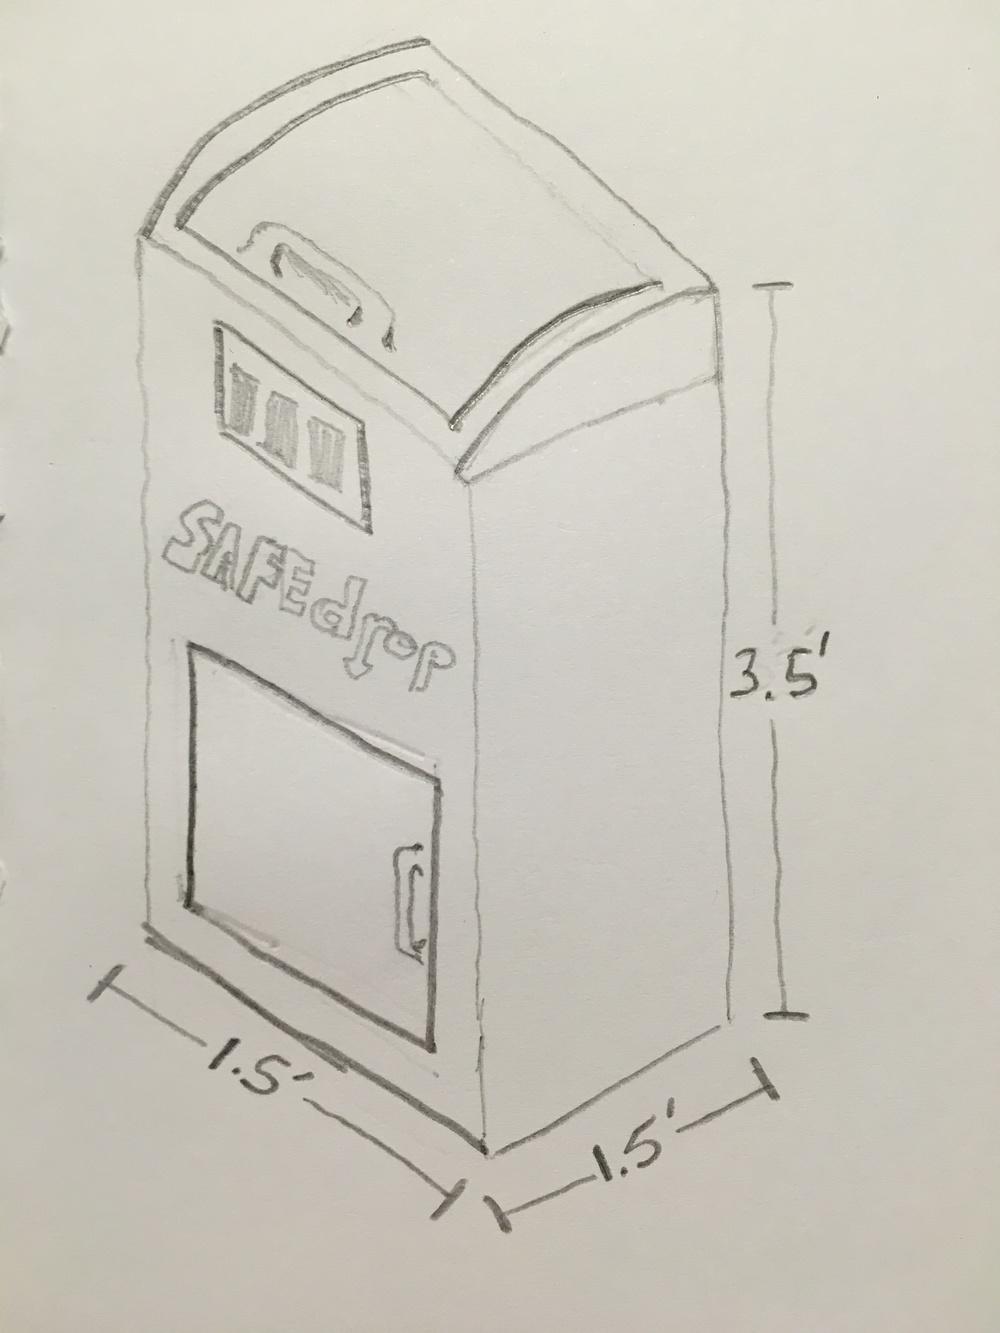 Prototype 2 Sketch